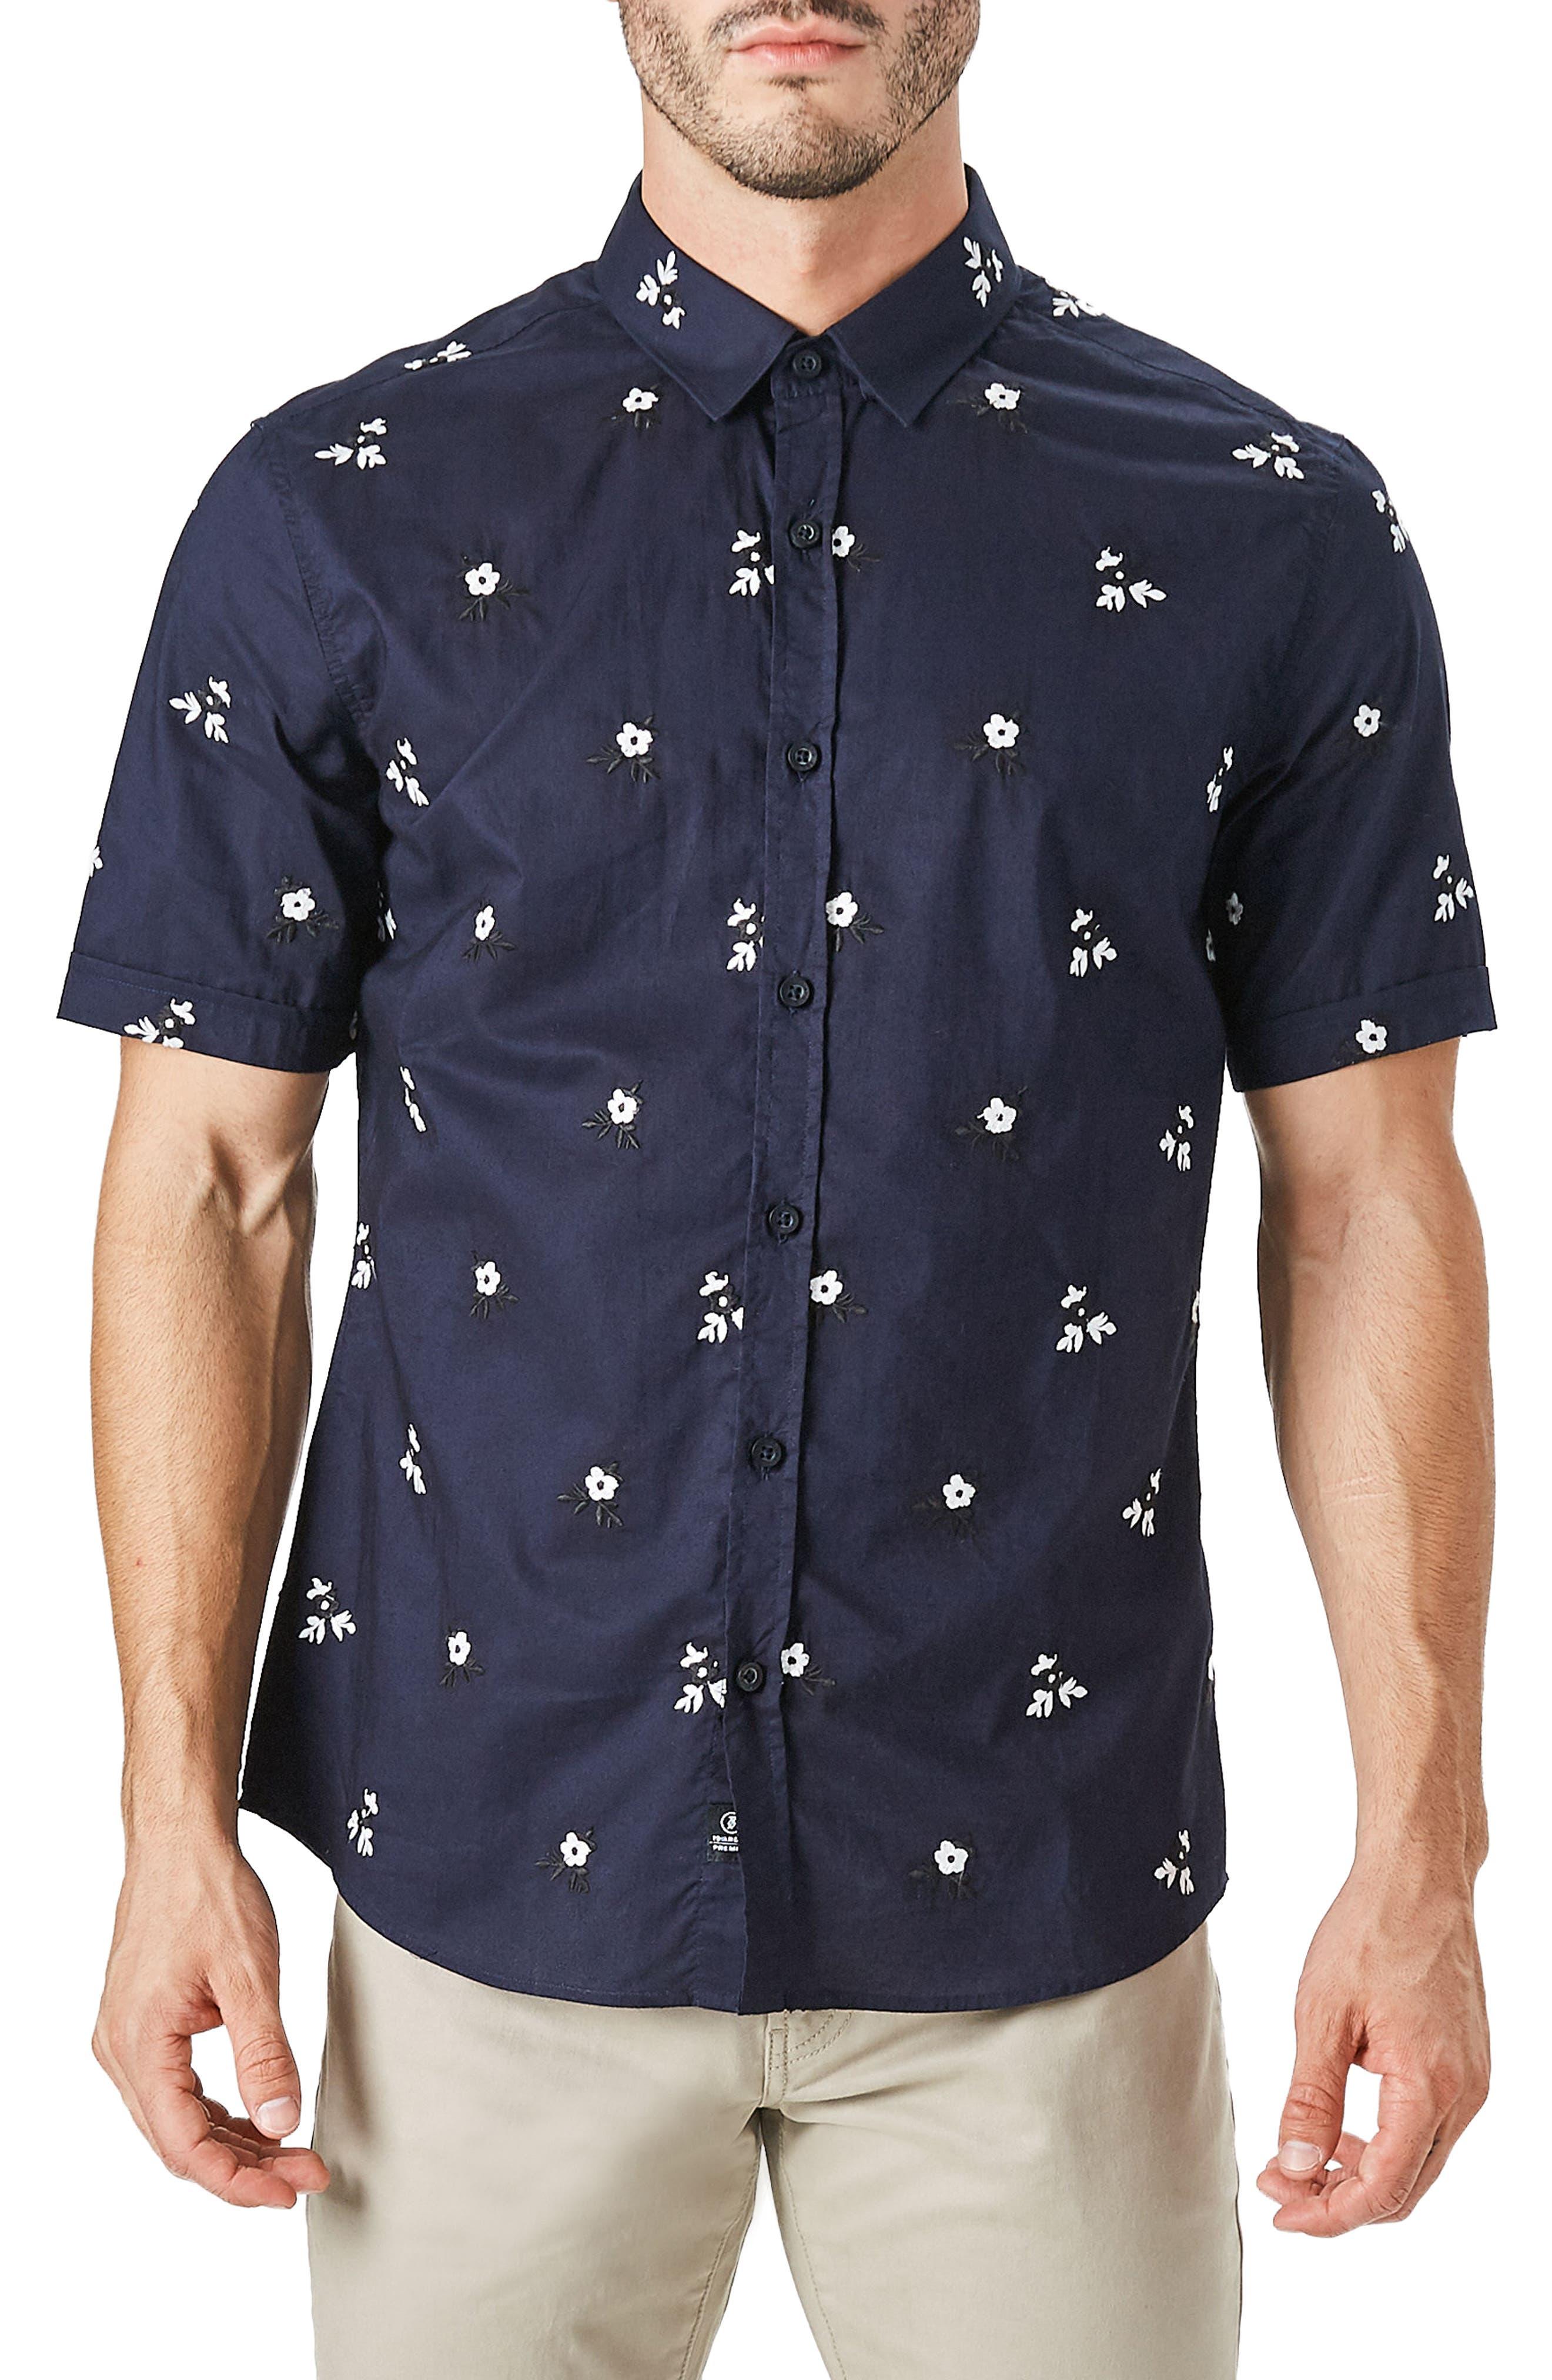 Main Image - 7 Diamonds Isolator Woven Shirt